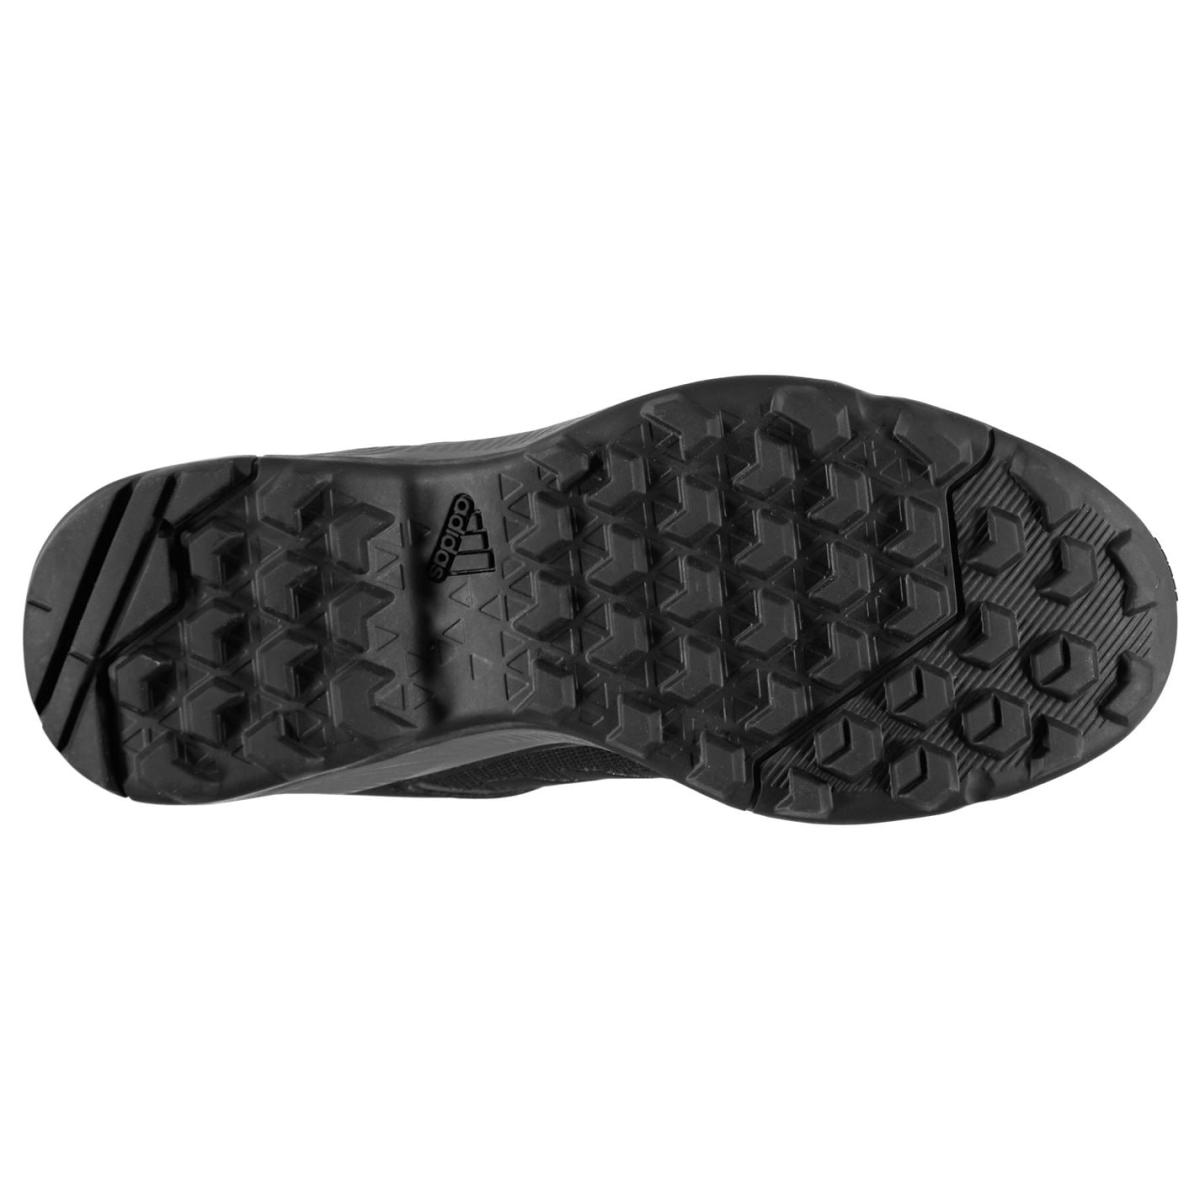 adidas-Terrex-Turnschuhe-Damen-Sneaker-Sportschuhe-Laufschuhe-7008 Indexbild 3